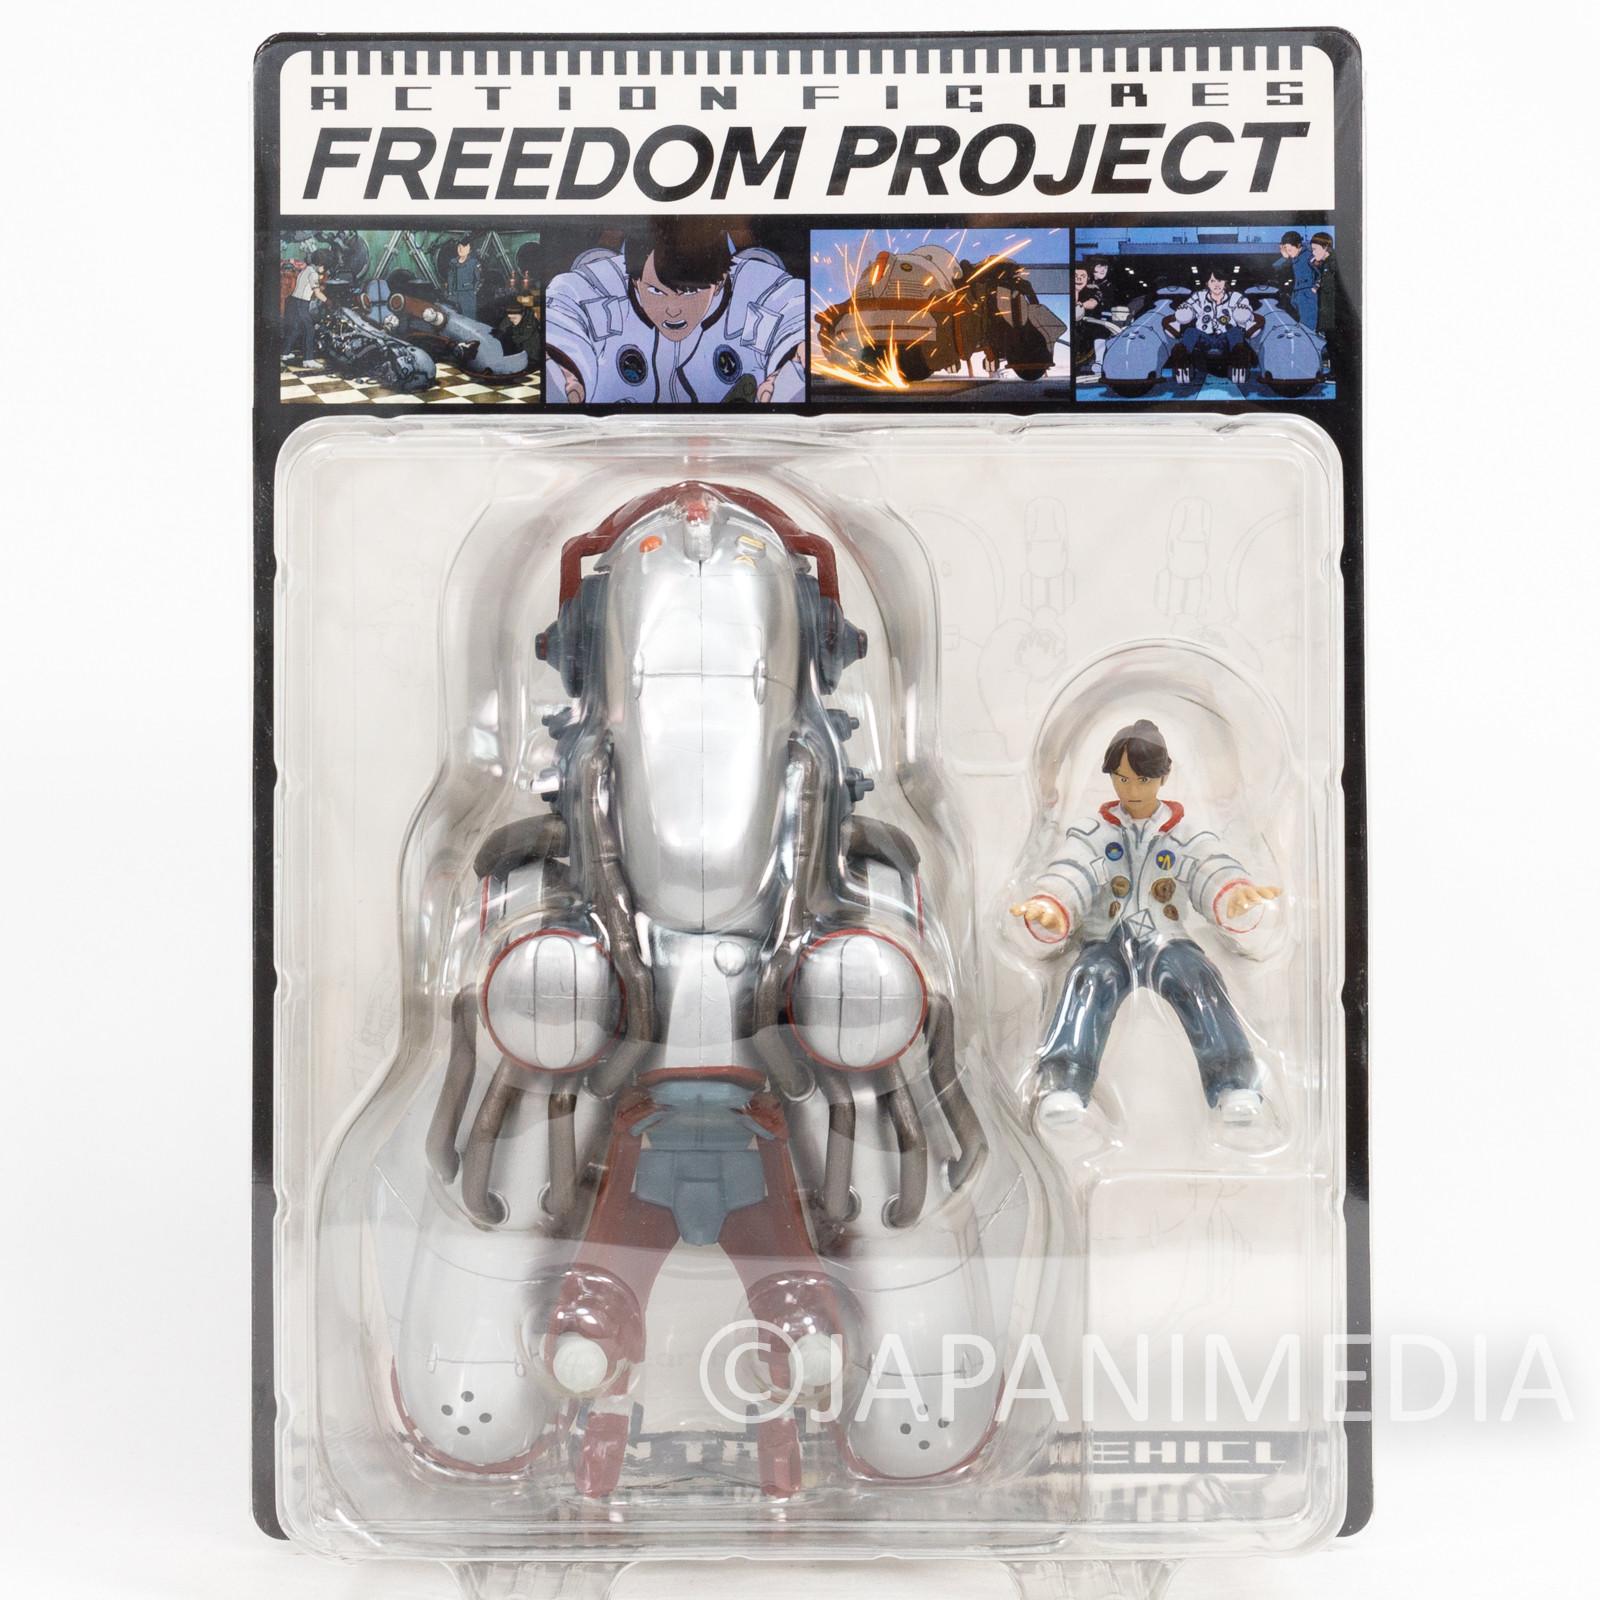 FREEDOM Takeru in Tricycle Vehicle Figure Katsuhiro Otomo ANIME 2